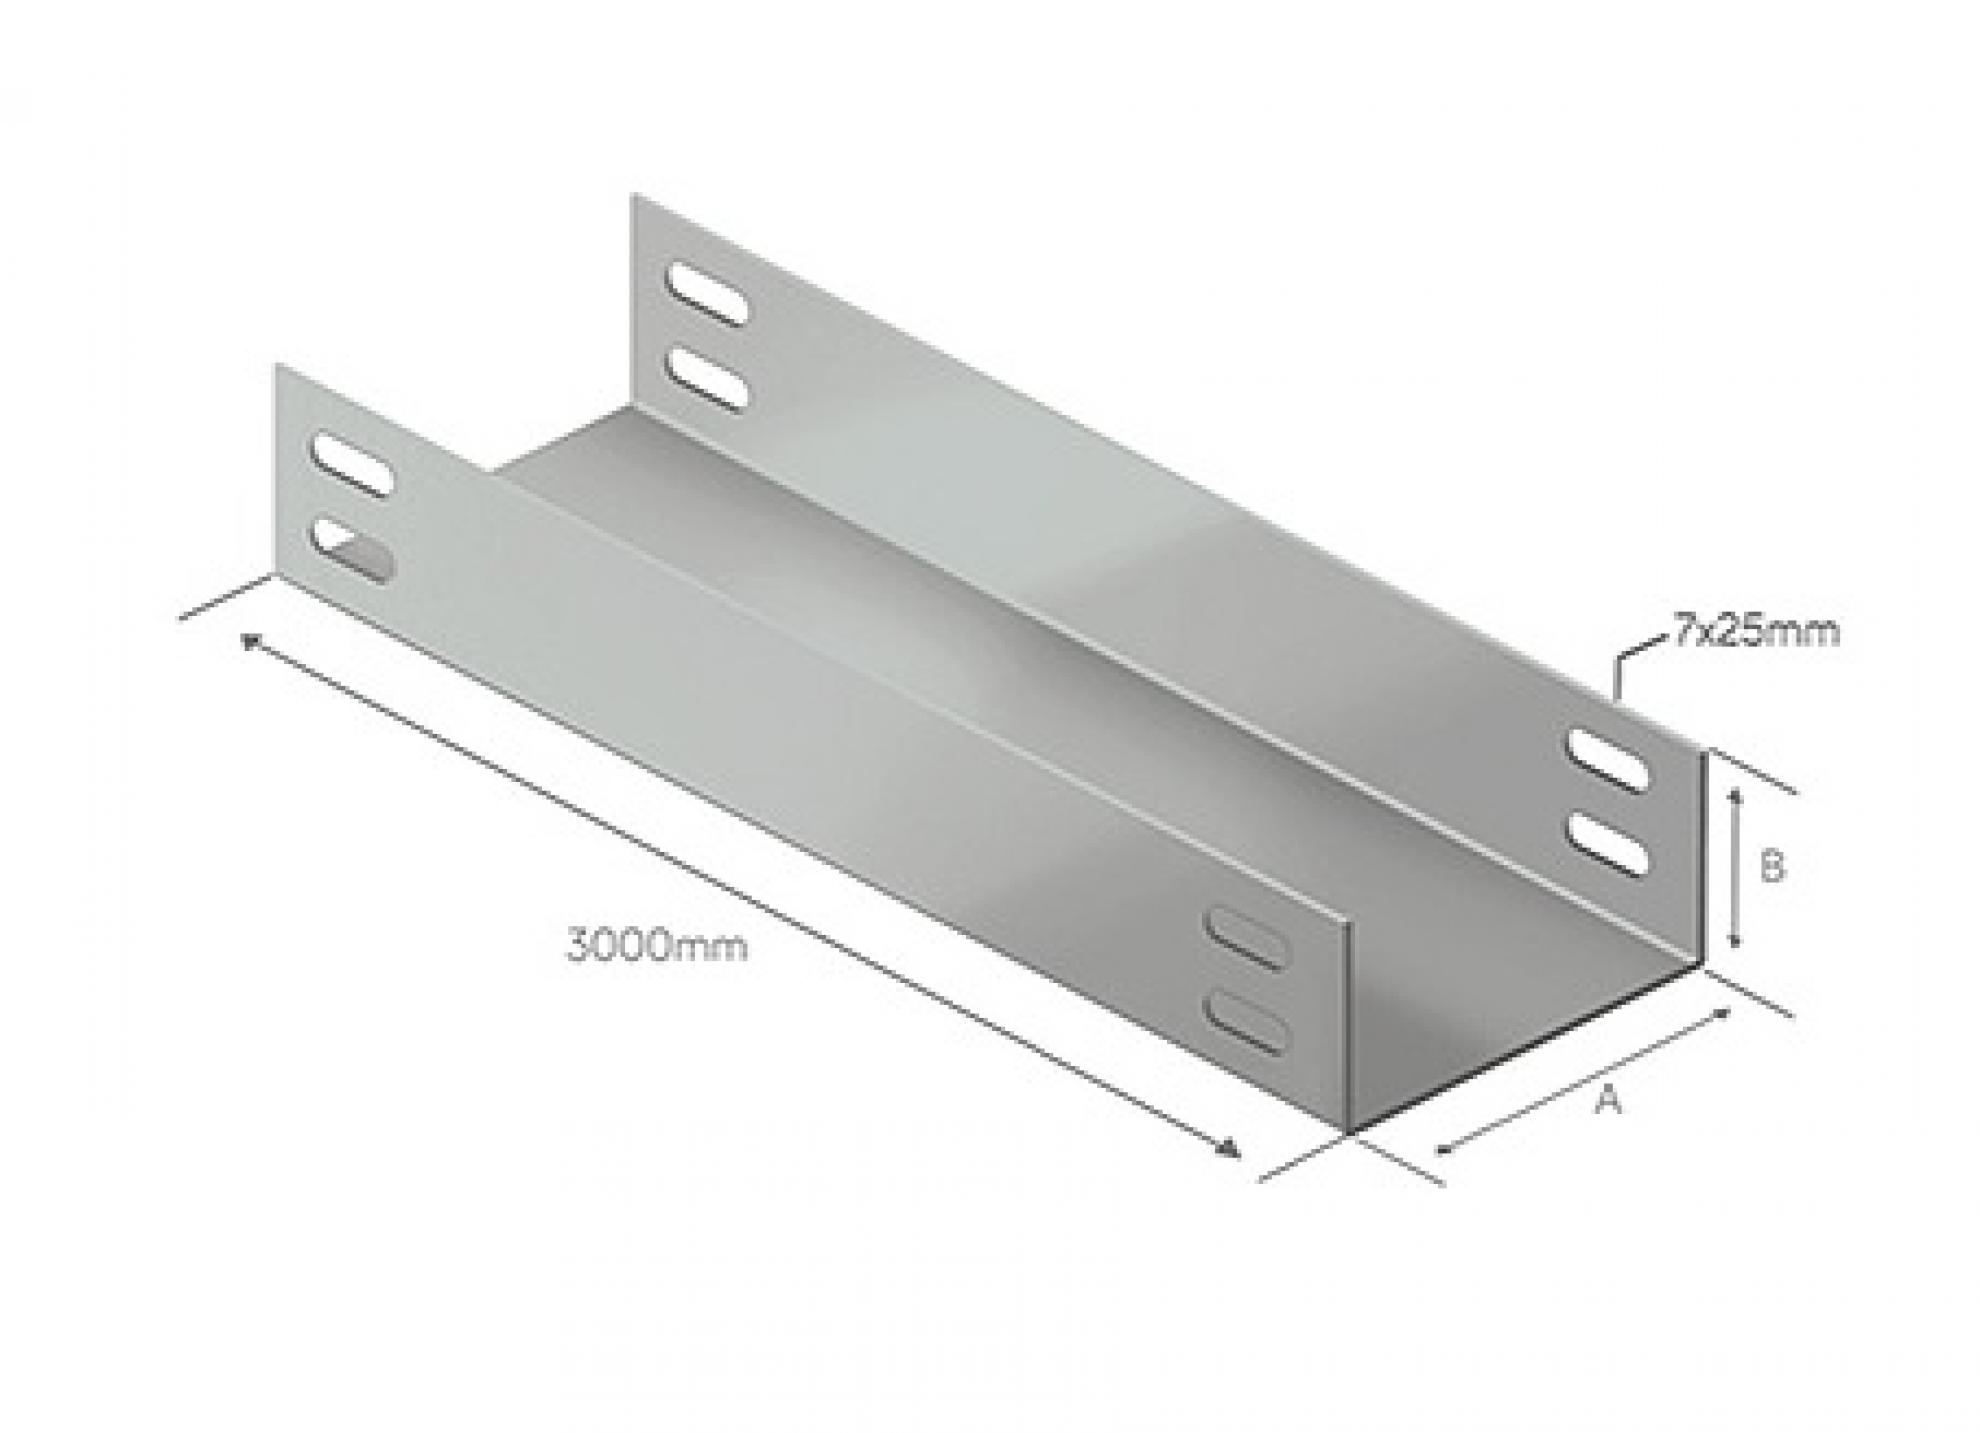 Eletrocalha lisa 300x50 - 3000MM